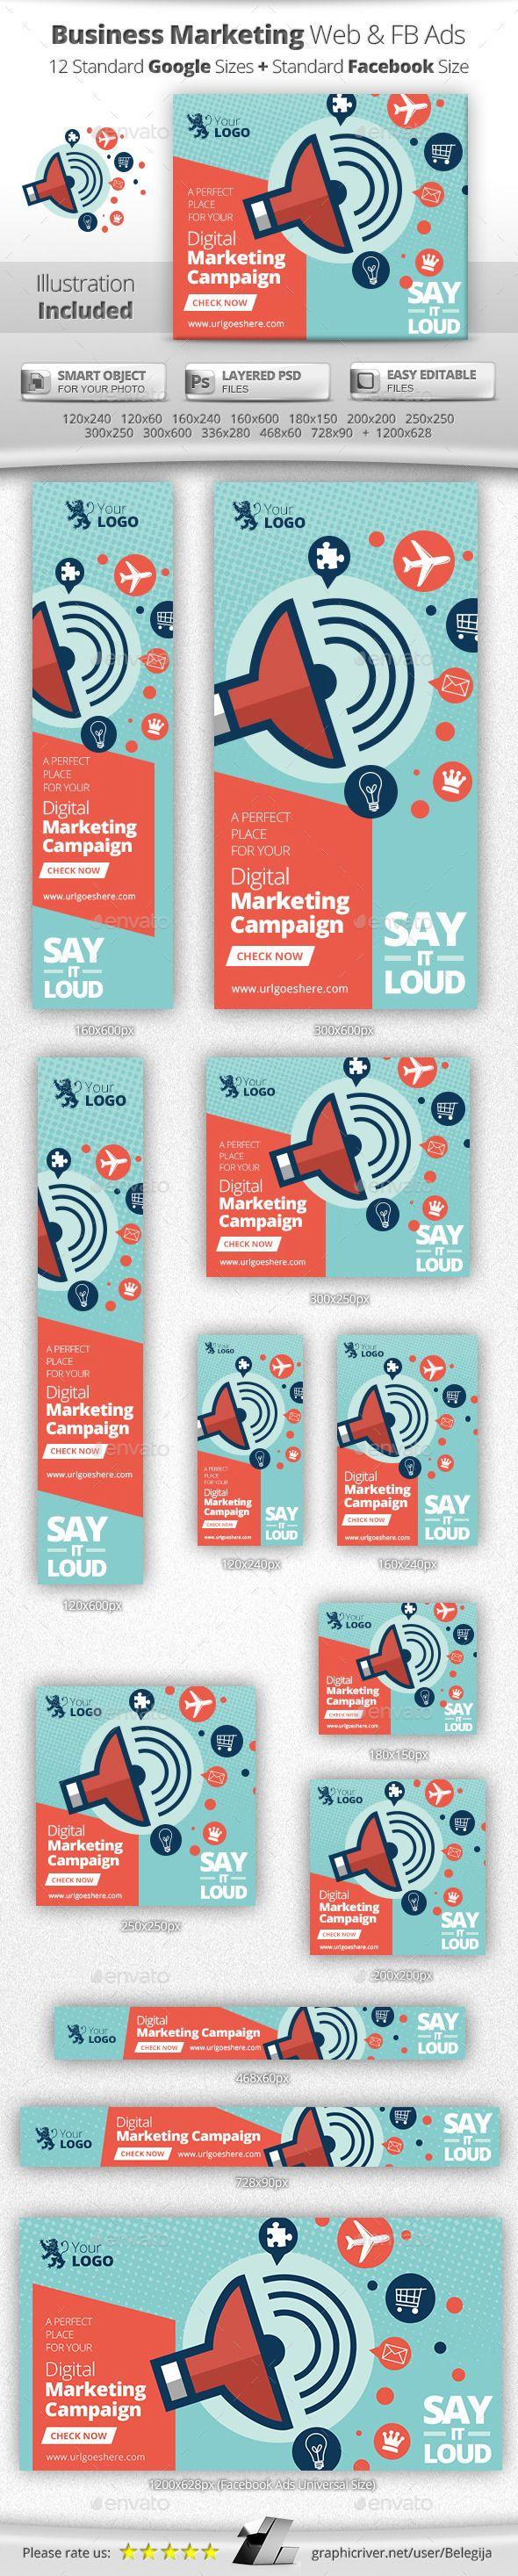 Business Online Marketing Web & Facebook Banners